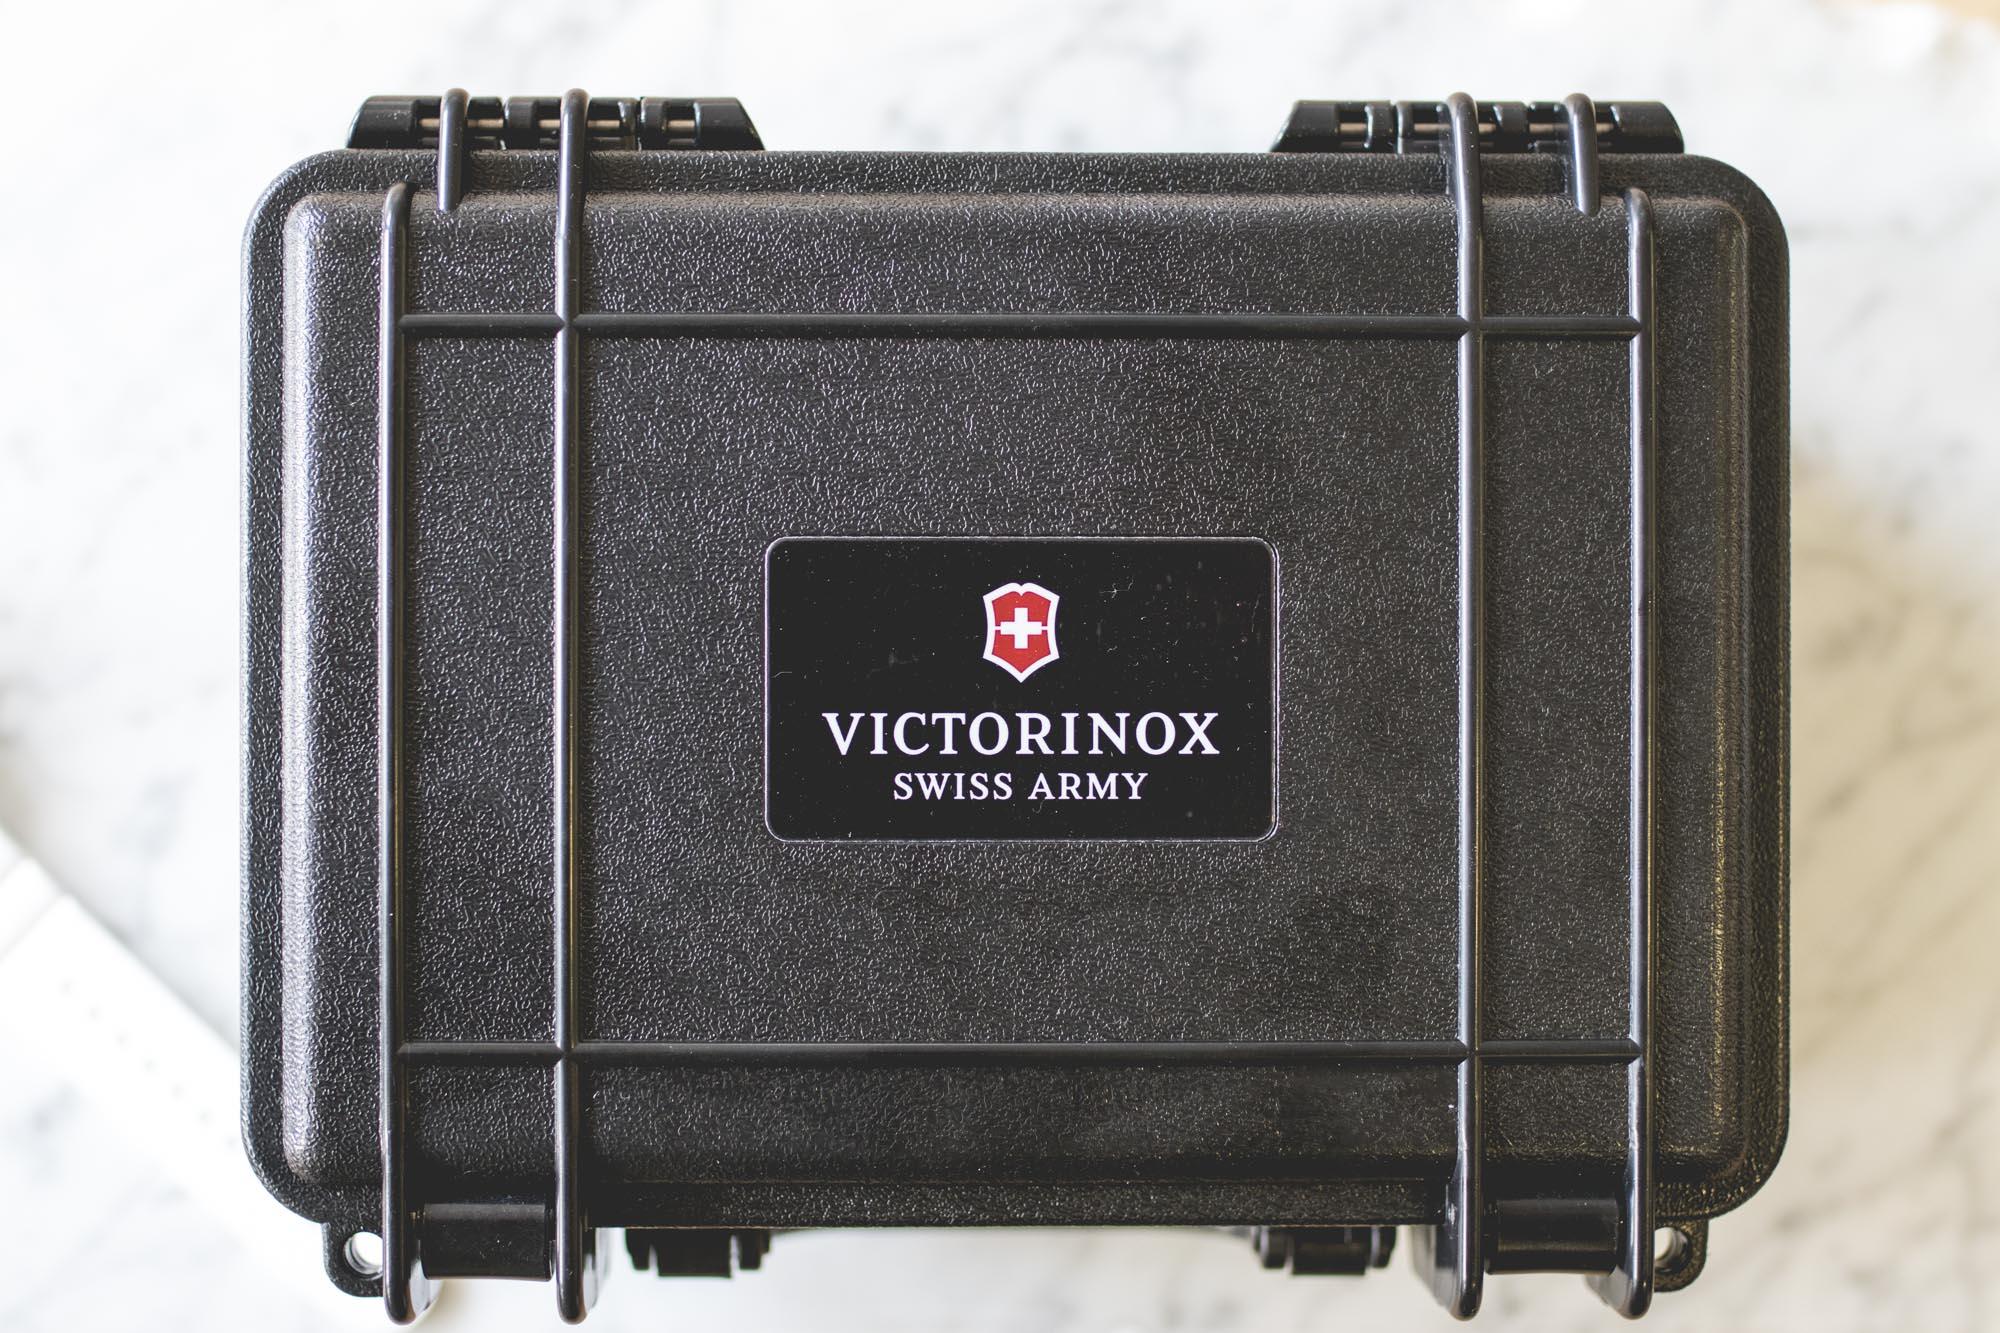 Victorinox INOX Titanium Sky High Limited Edition